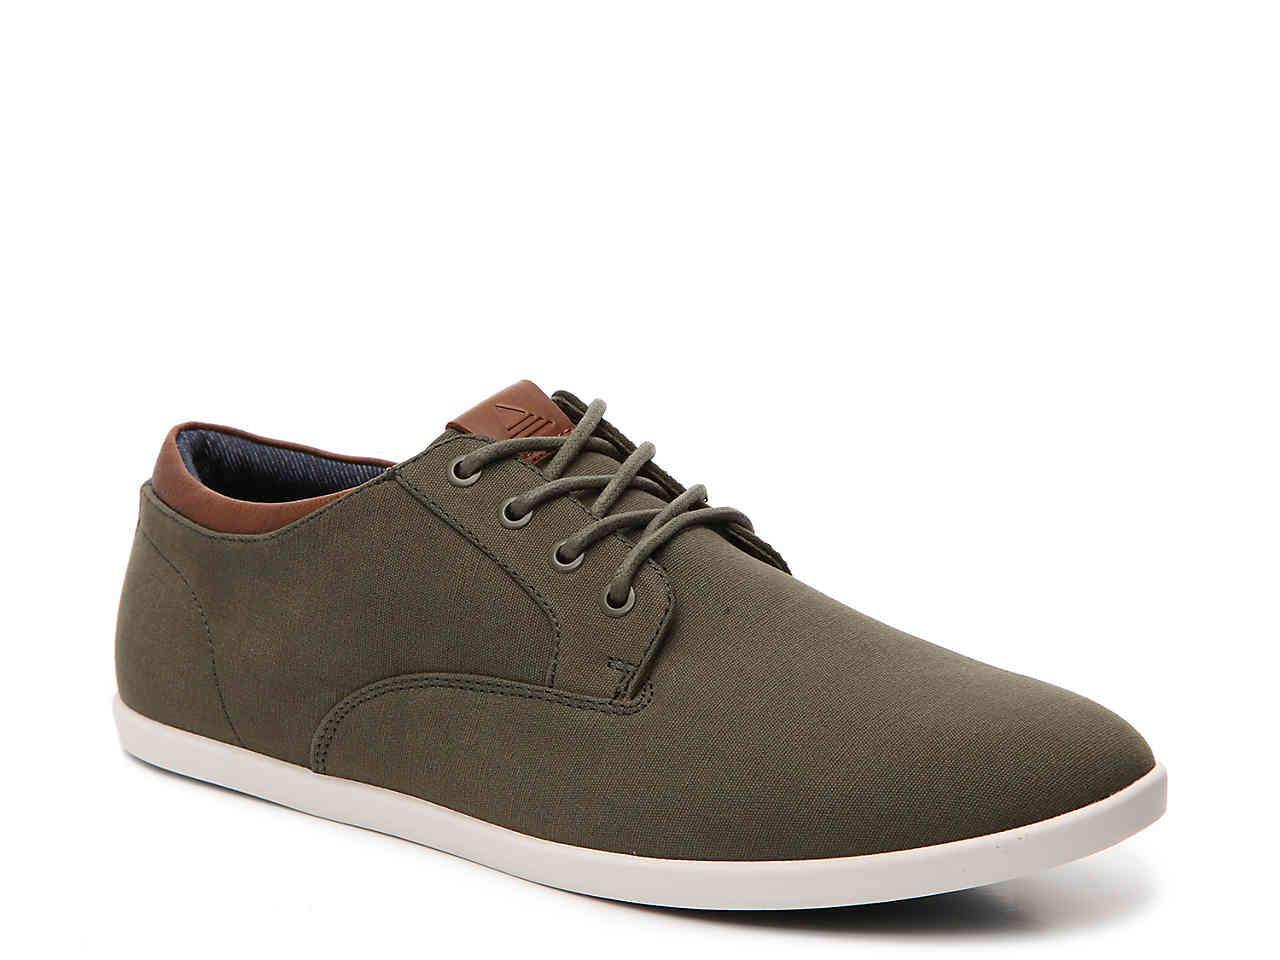 ALDO Canvas Arger Sneaker in Olive